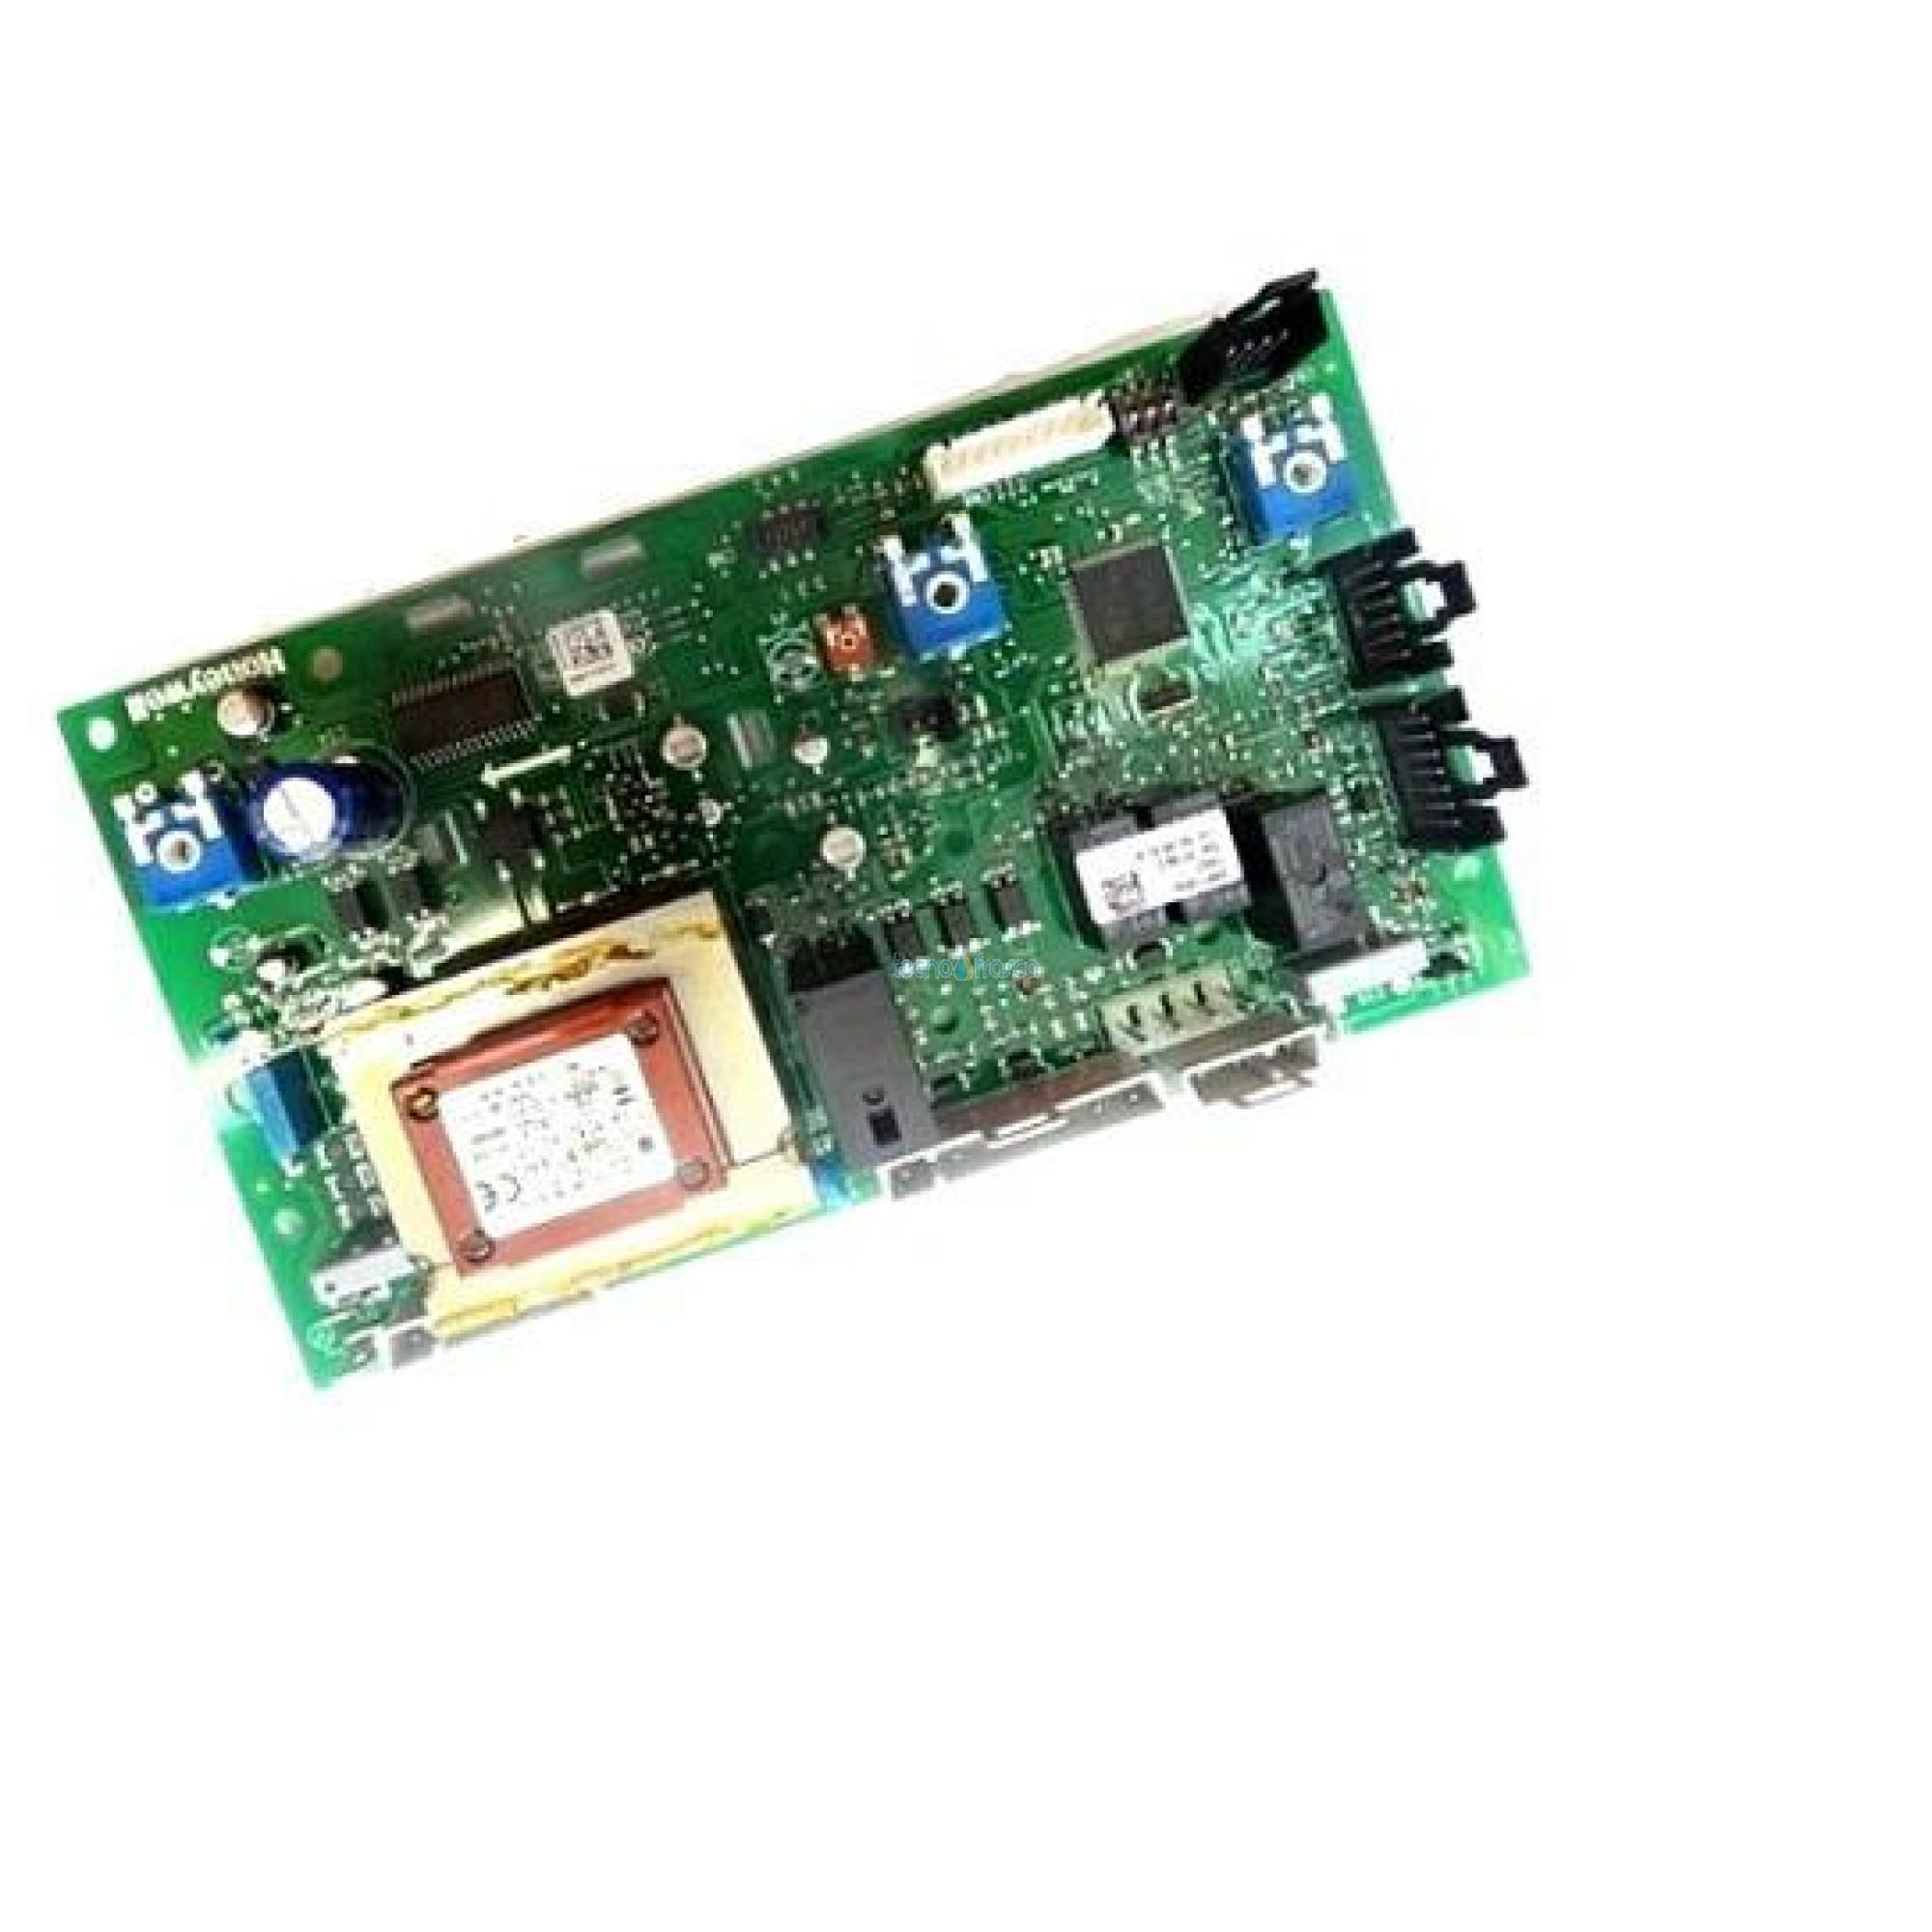 Baxi scheda honeywell eco 3 sm11454 jjj005686920